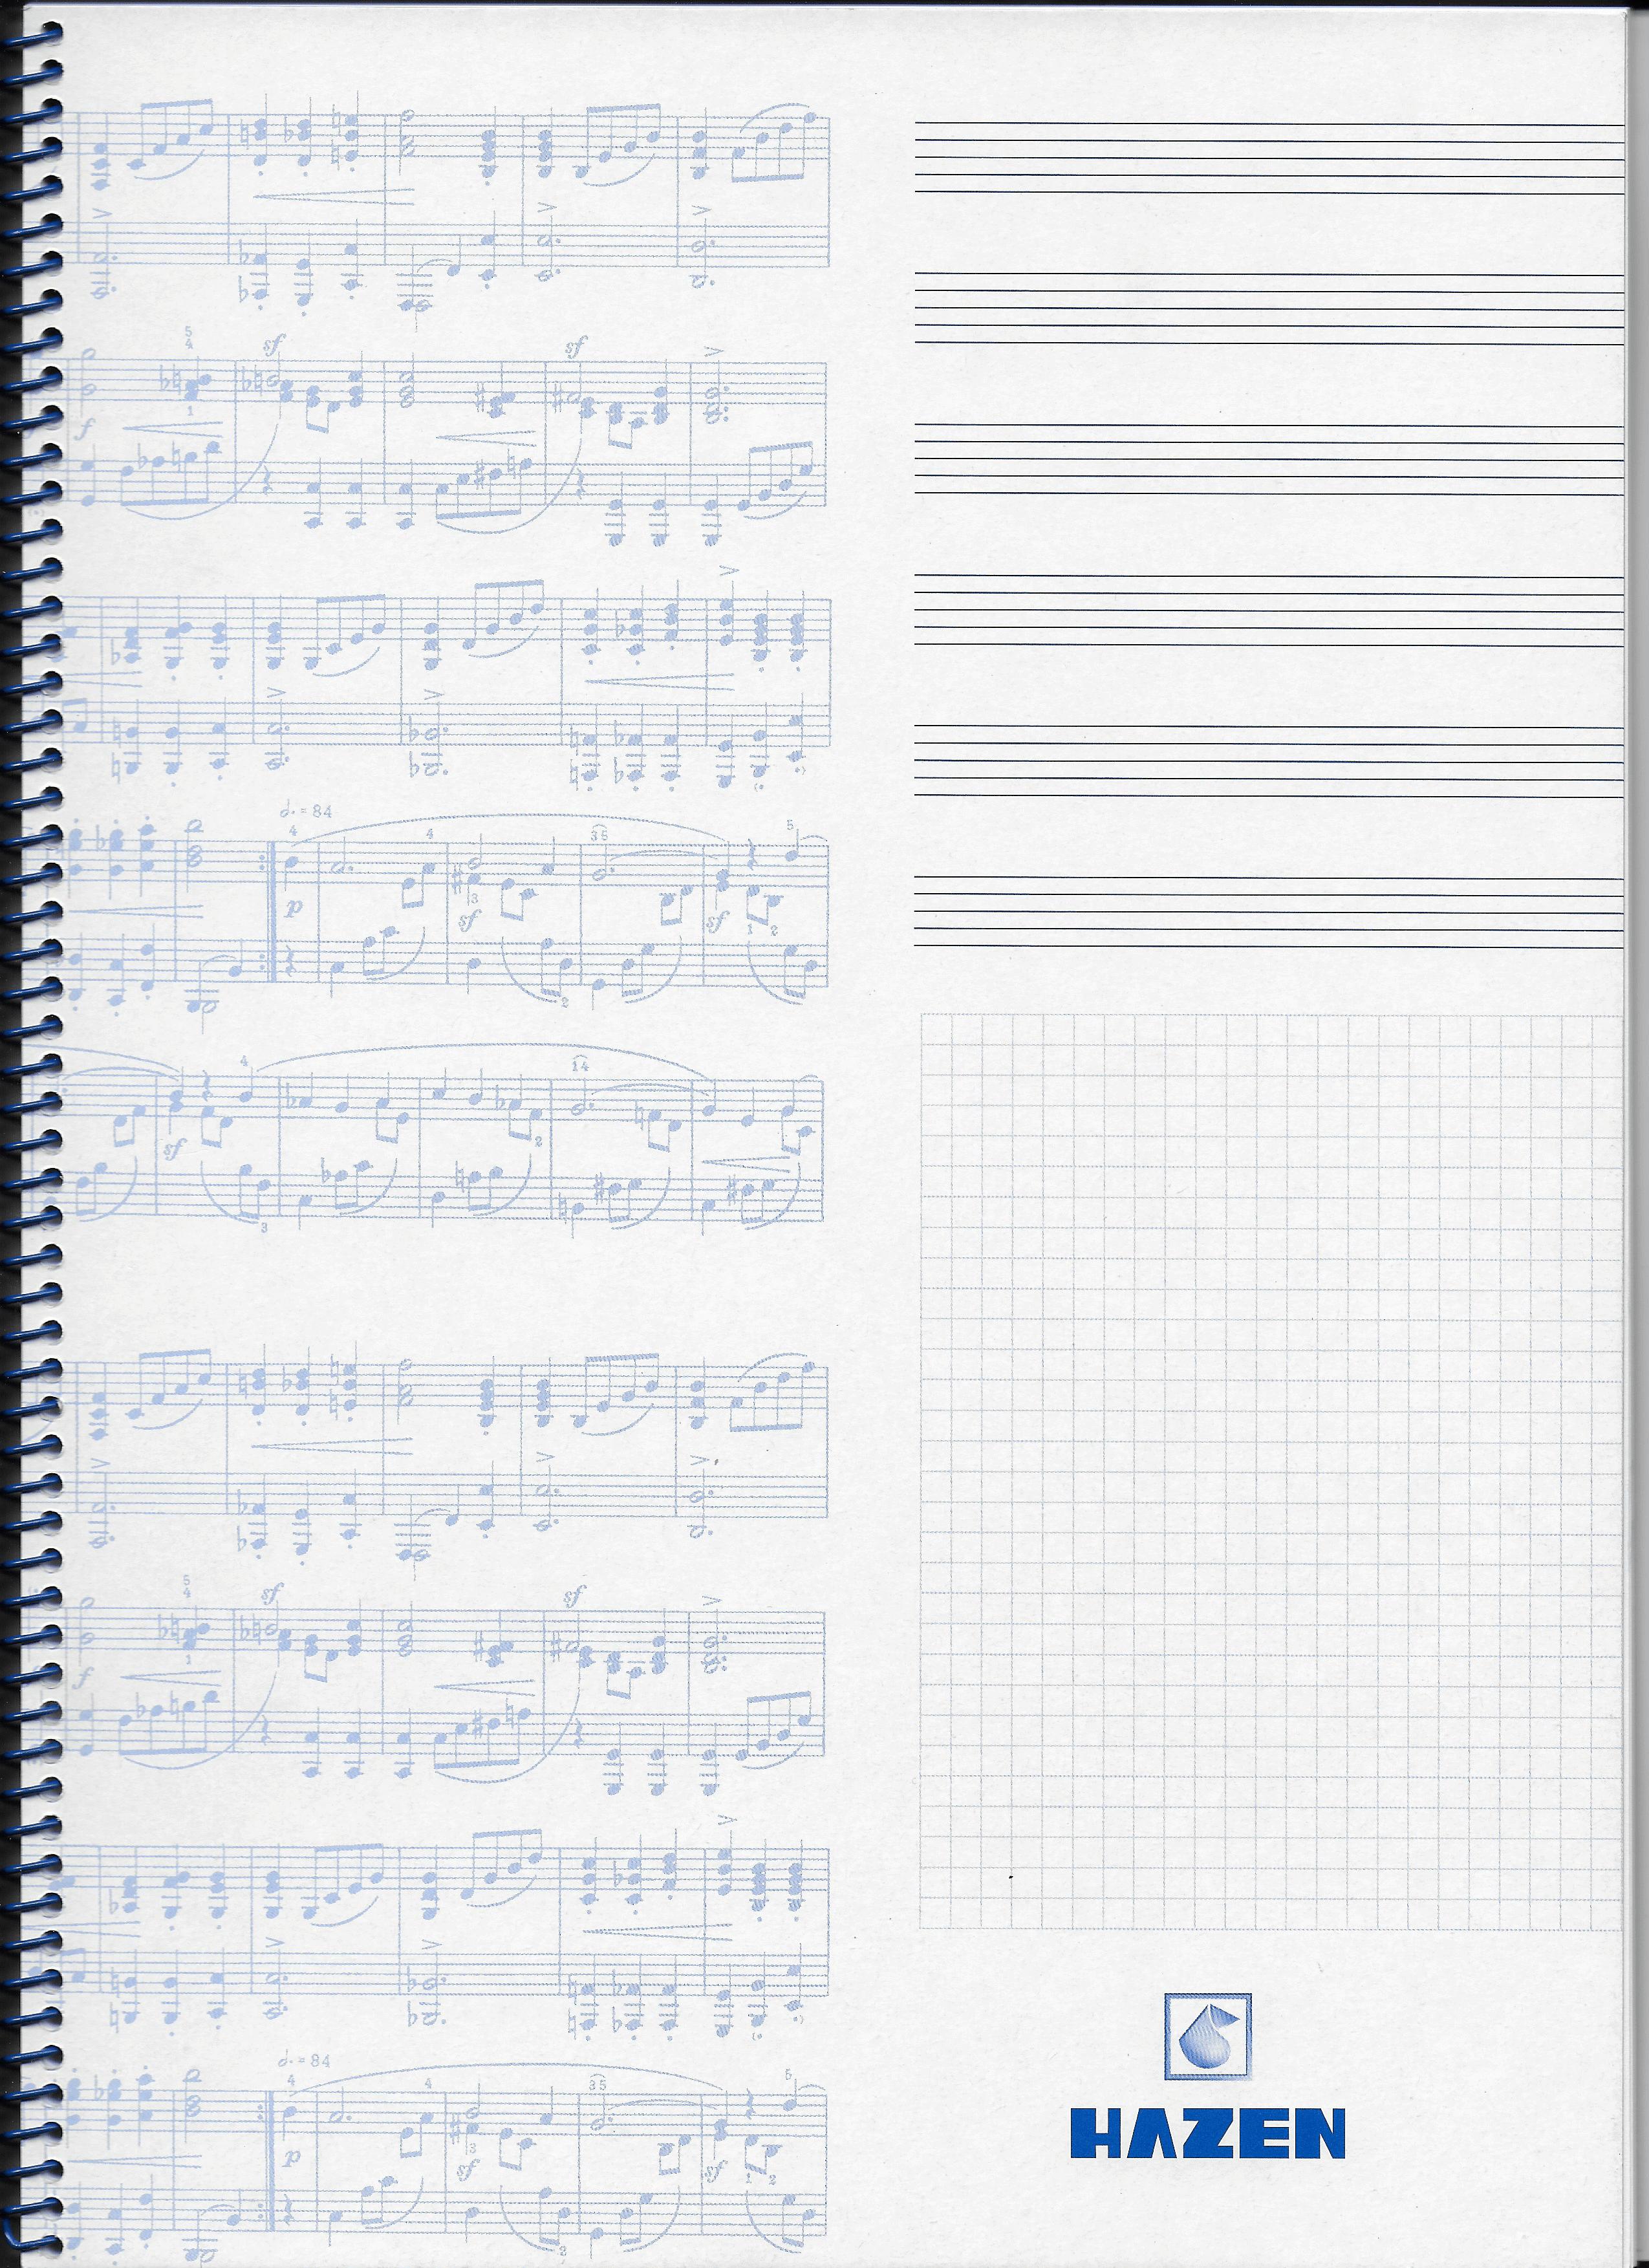 Block Hazen Vertical 1/2 6 Pautas + 1/2 Cuadricula